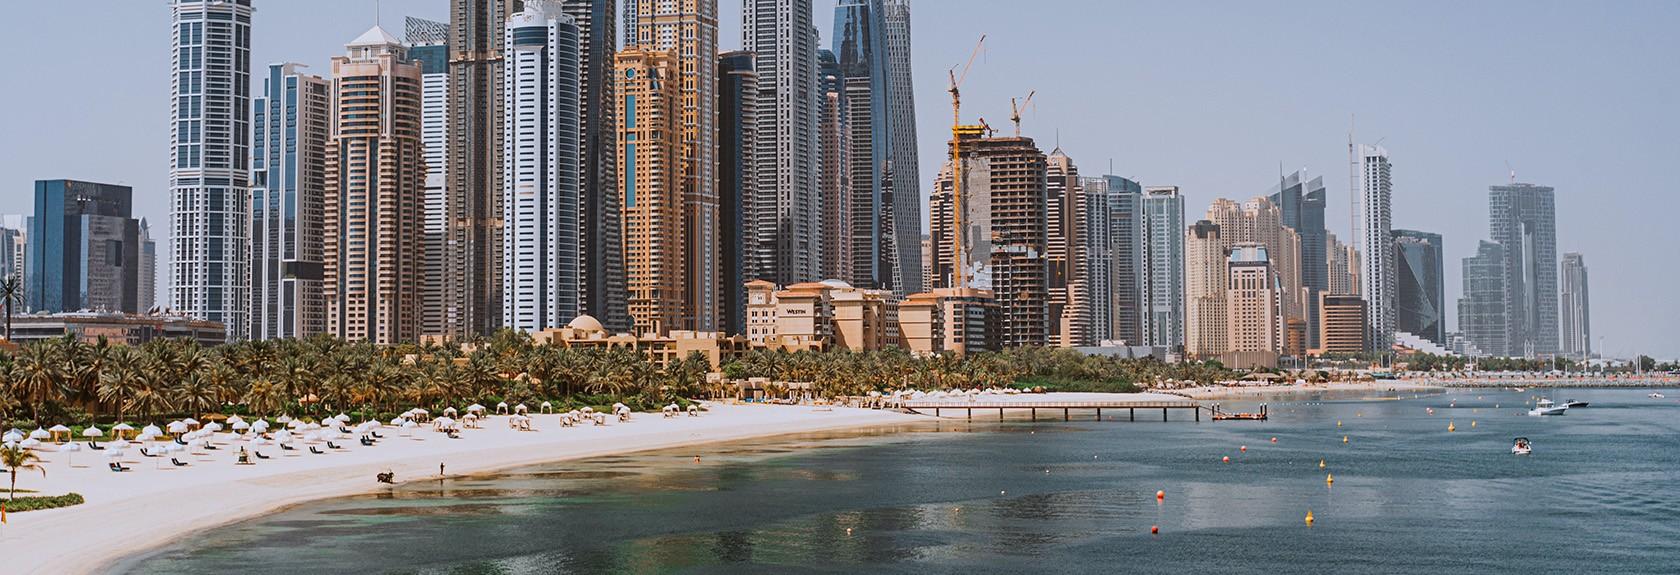 Corona en vakantie in Dubai